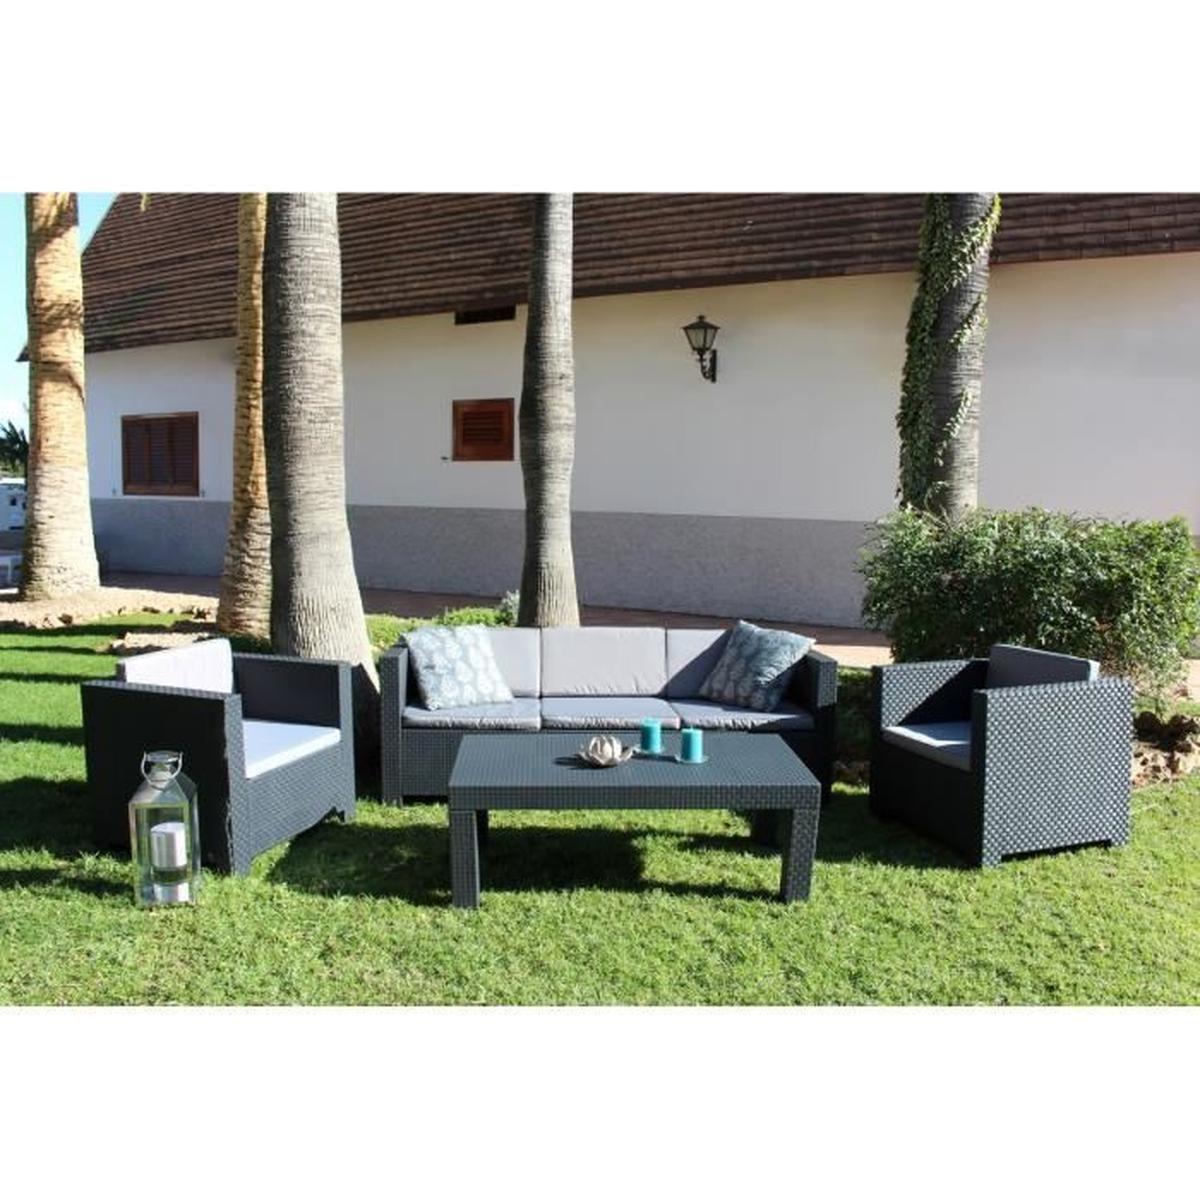 Tropea: Salon De Jardin 5 Places Effet Résine Tressée ... intérieur Cdiscount Table De Jardin